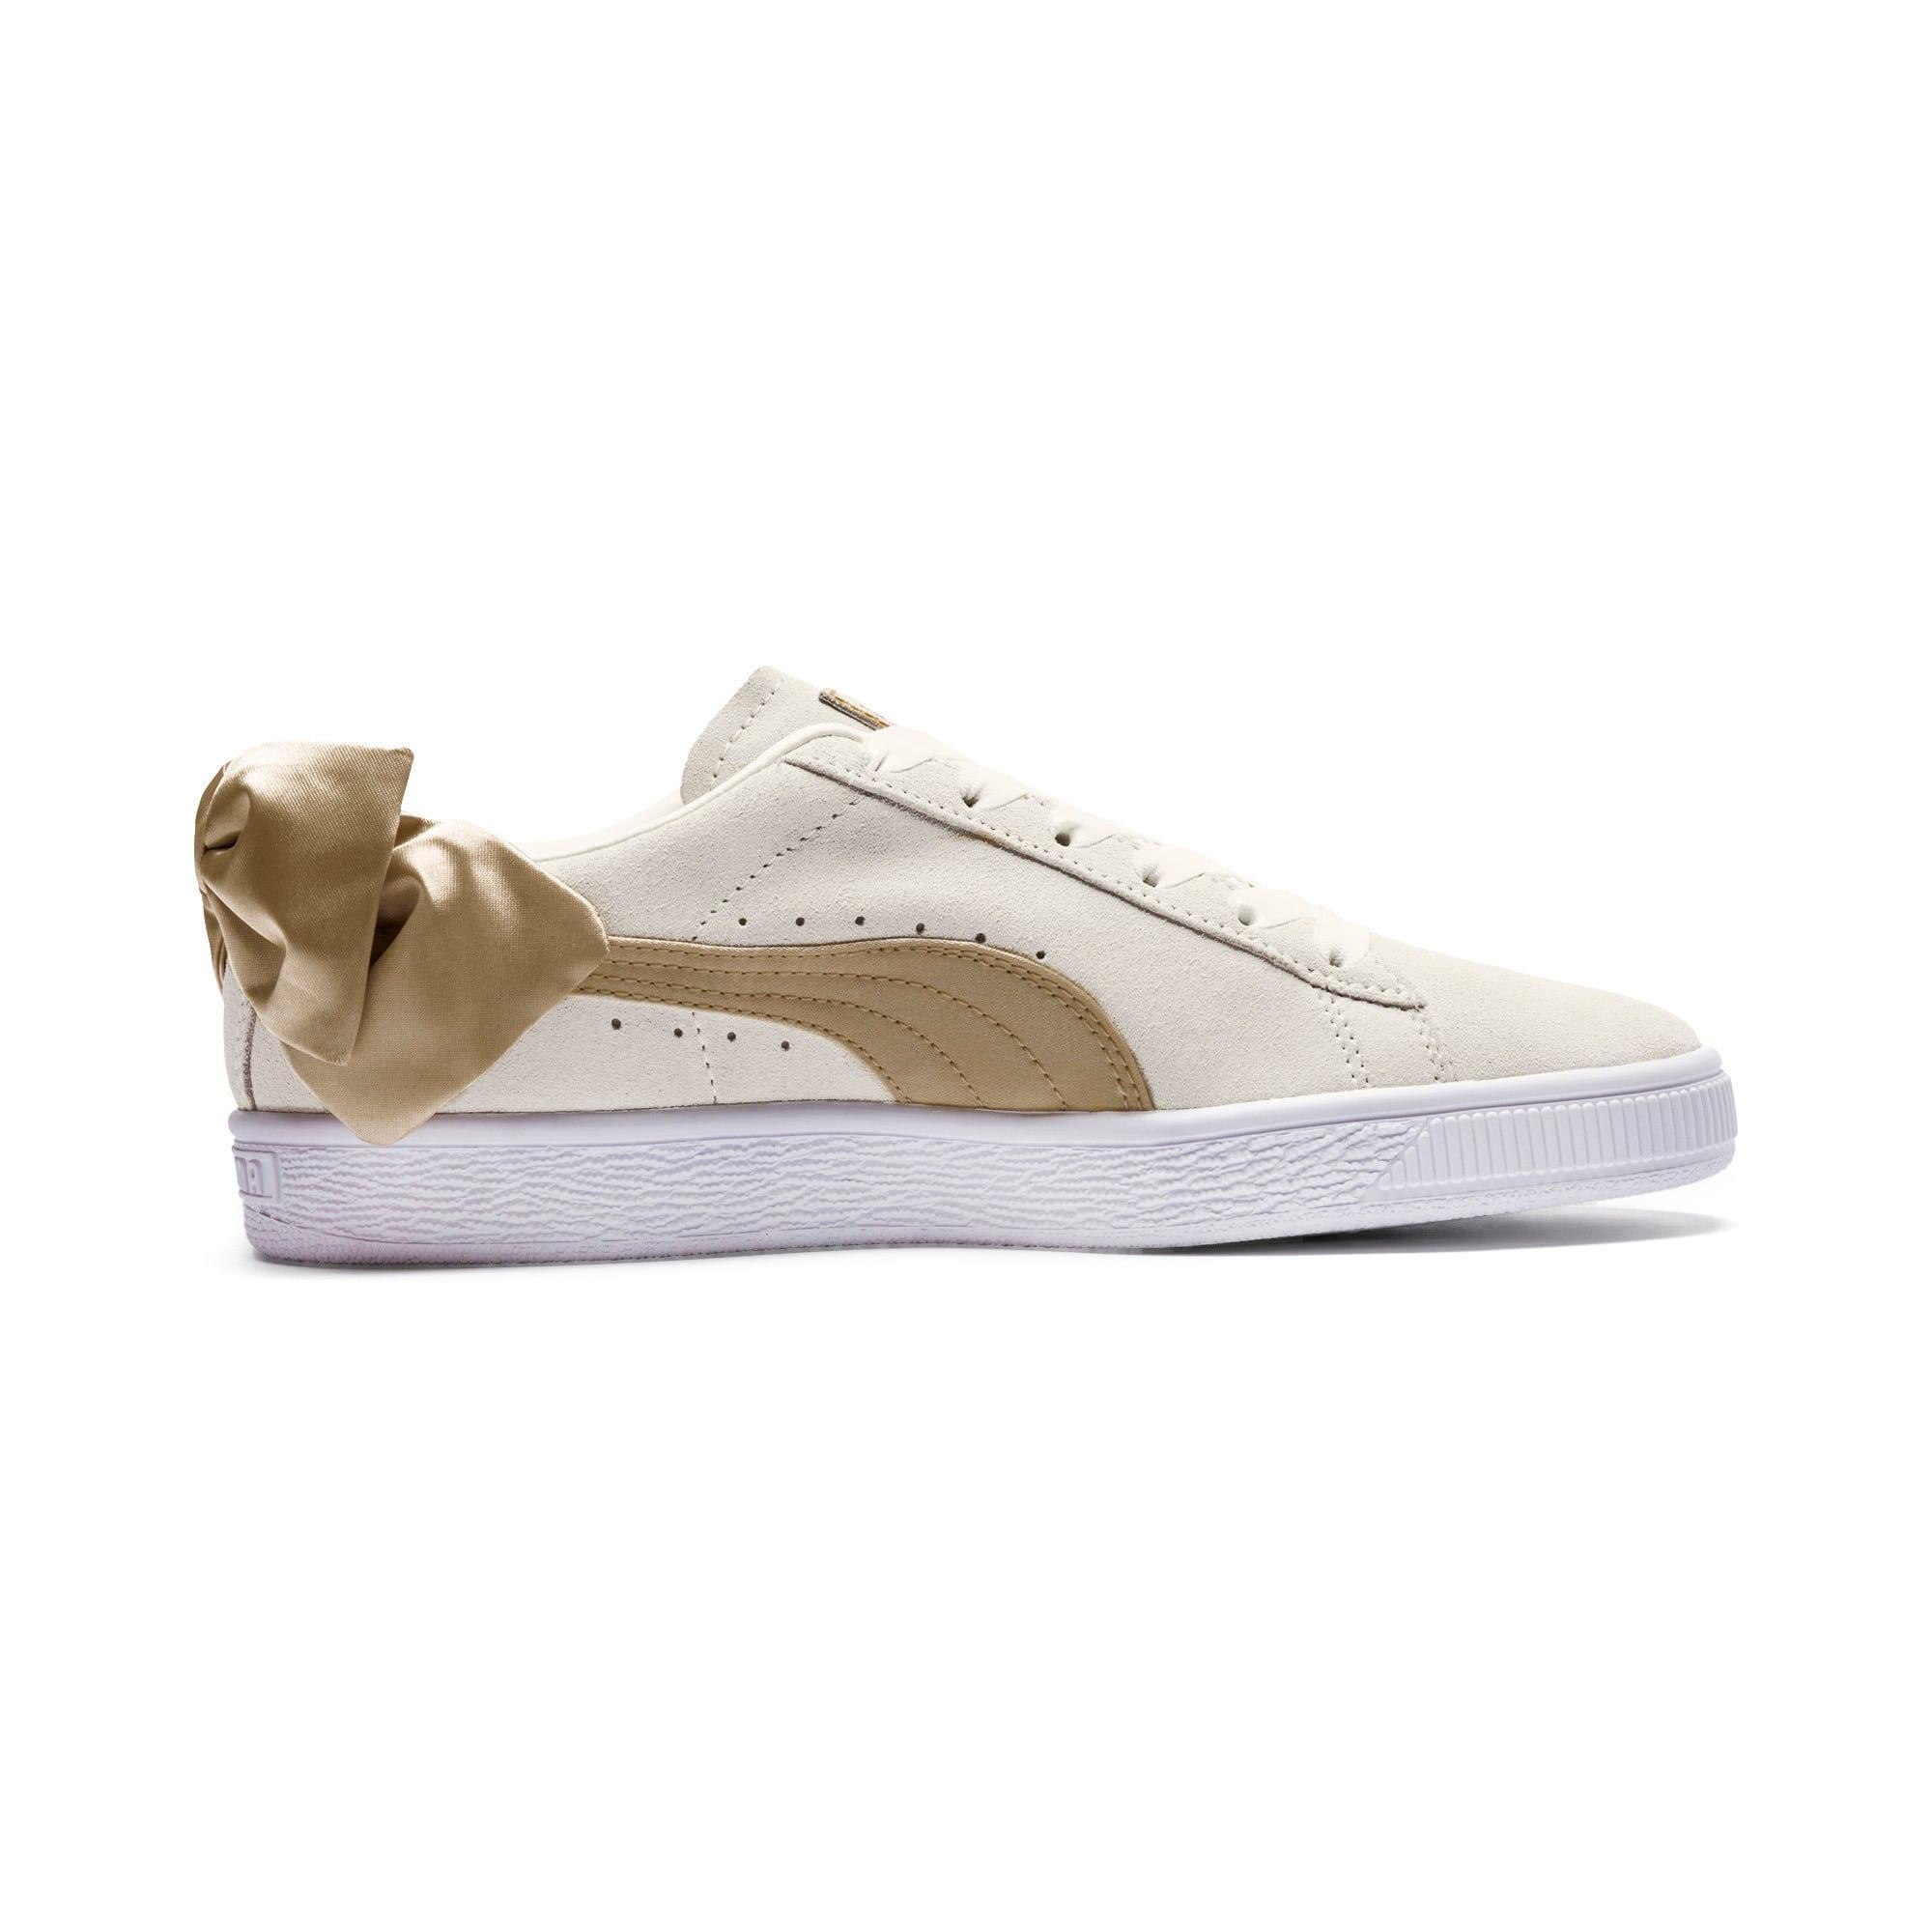 Thumbnail 5 of Suede Bow Varsity Women's Sneakers, Marshmallow-Metallic Gold, medium